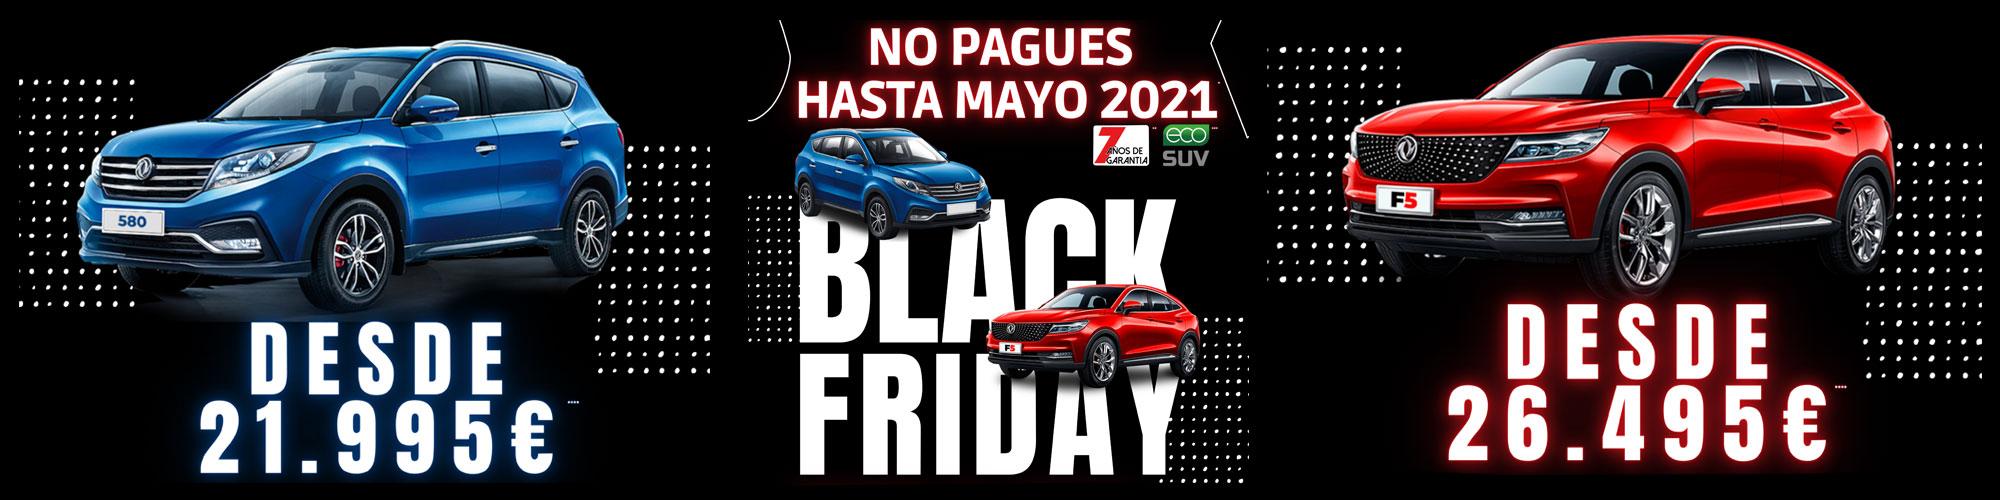 black friday dfsk motors España